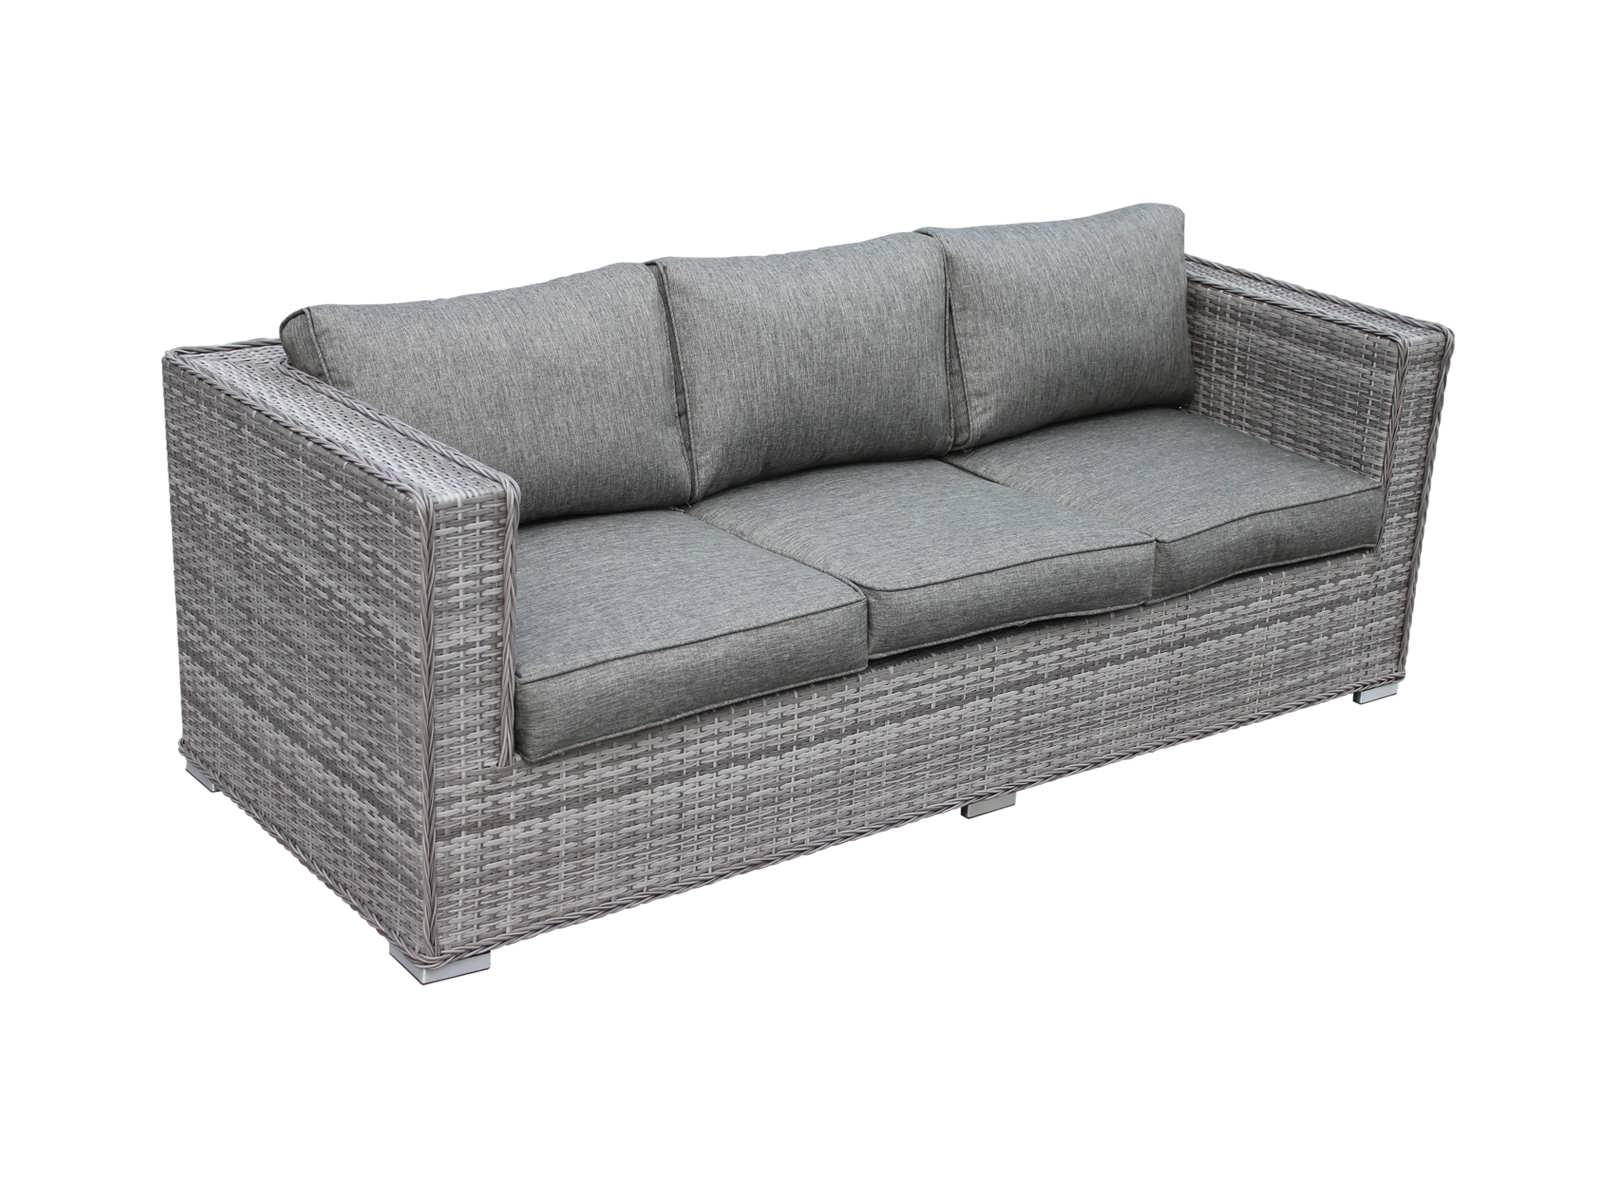 ascot 3 seat outdoor rattan sofa in grey MNWGANQ